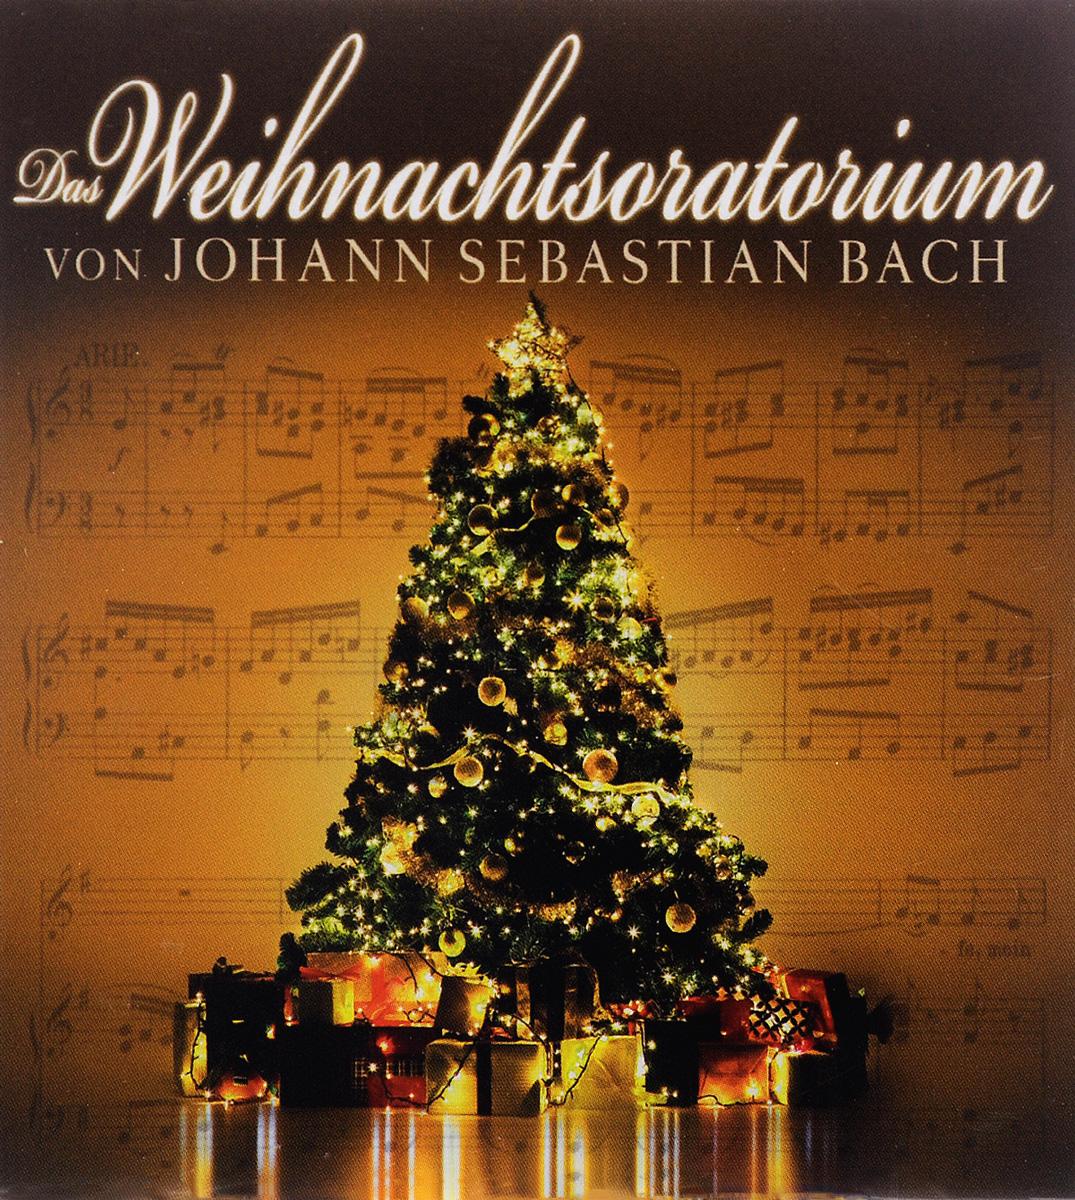 цена на Johann Sebastian Bach. Das Weihnachtsoratorium Von Johann Sebastian Bach